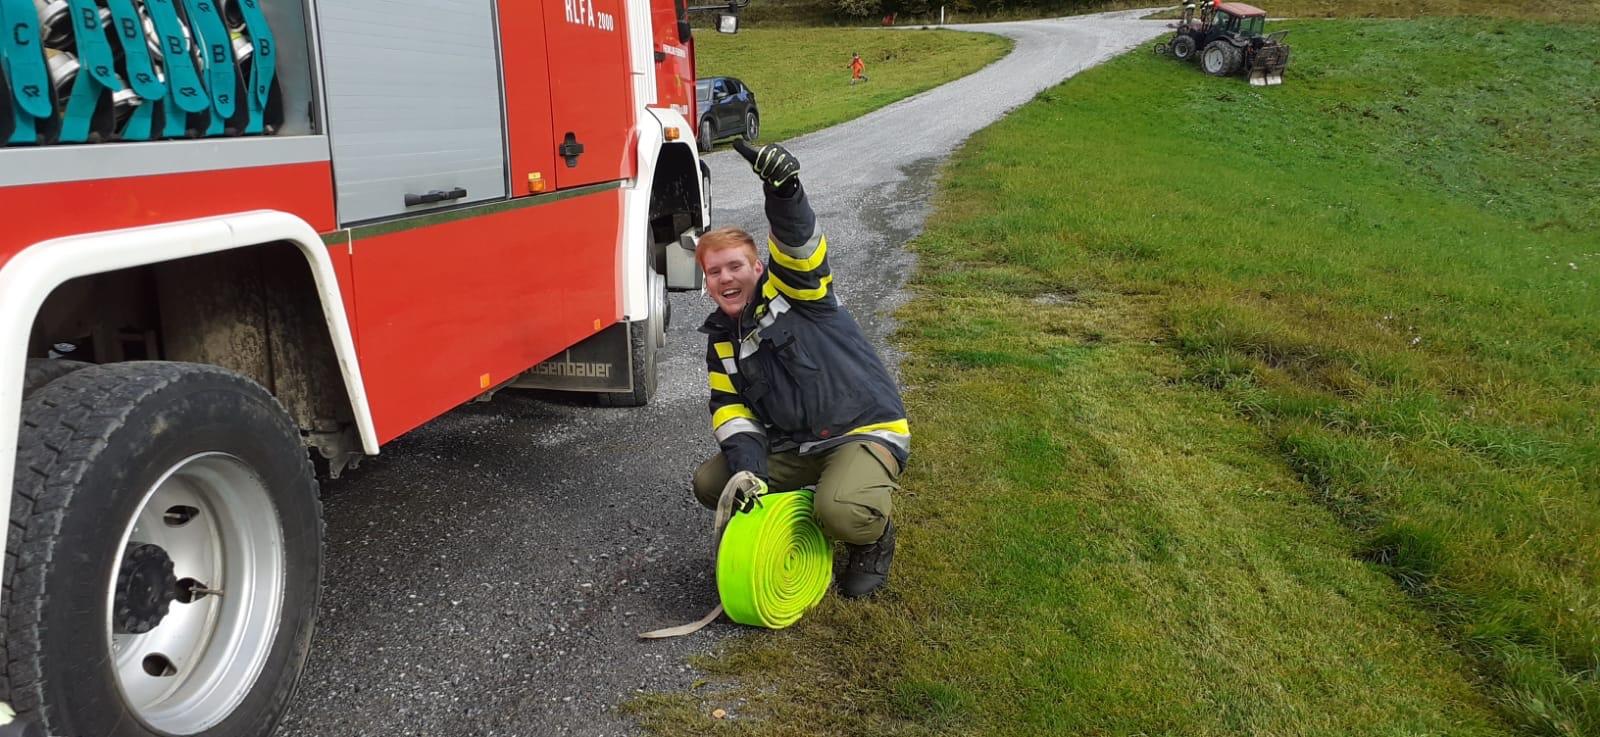 Feuerwehrübung bei Familie Kobald vlg. Golla